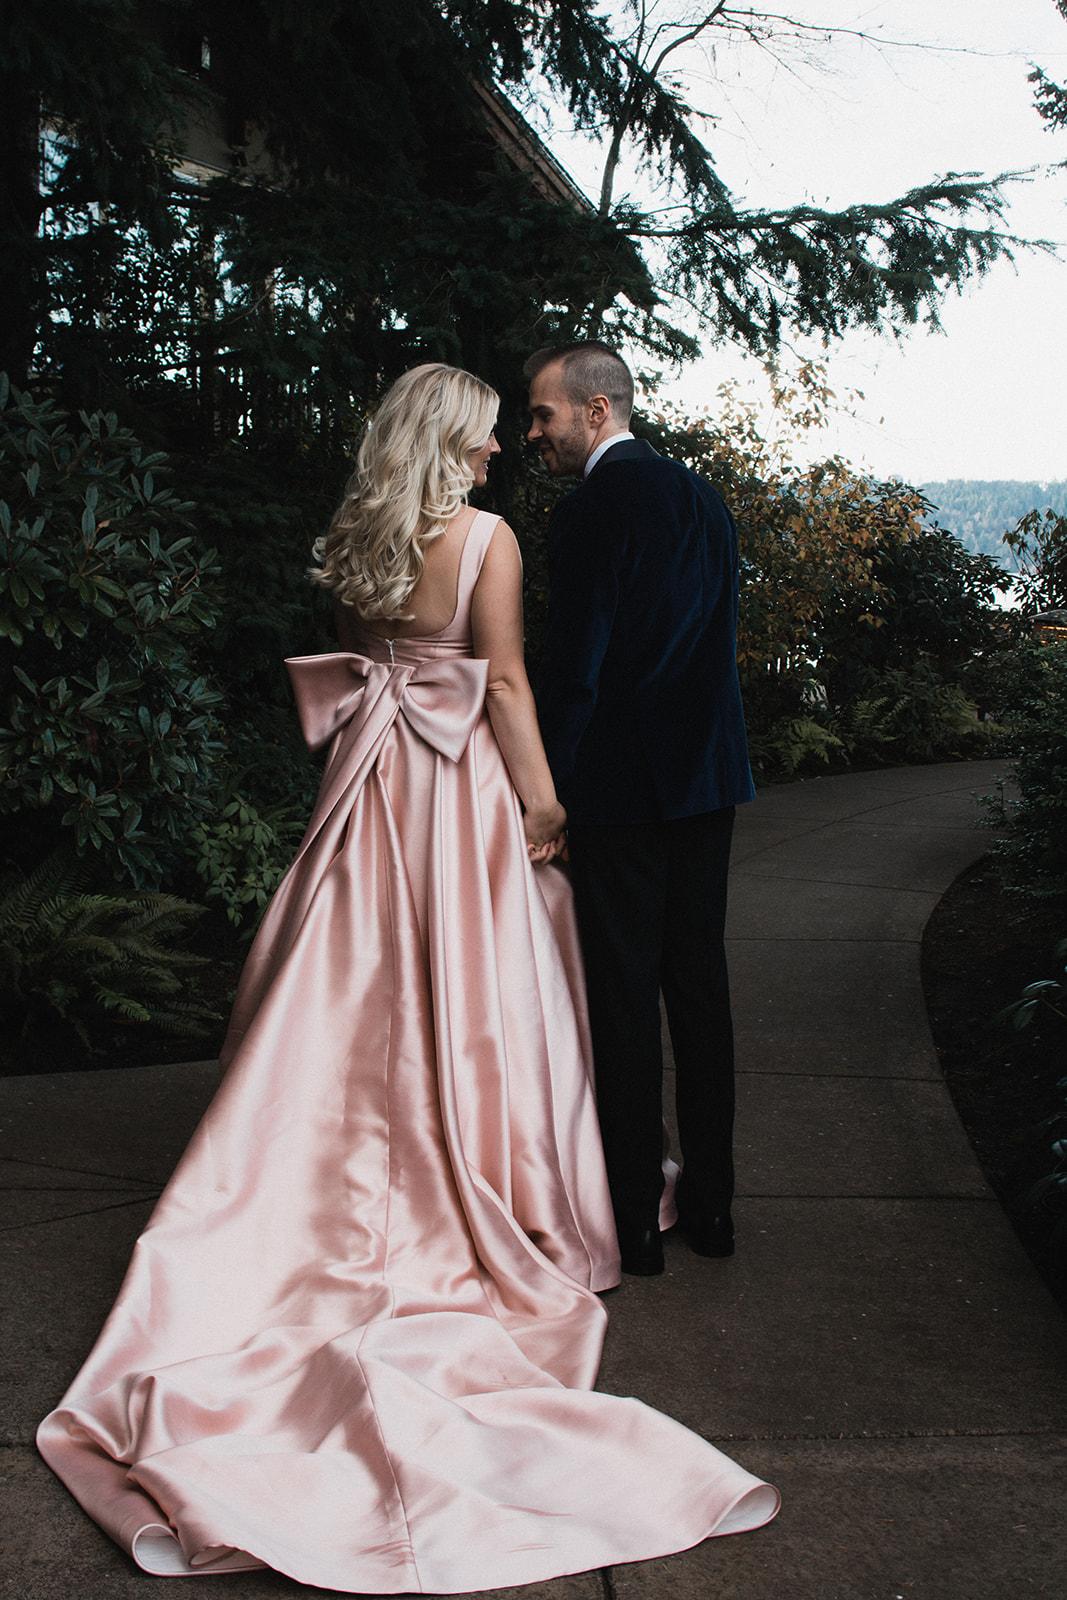 Bridalbliss.com | Seattle Wedding | Washington Event Coordination and Design | Sullivan & Sullivan Photography